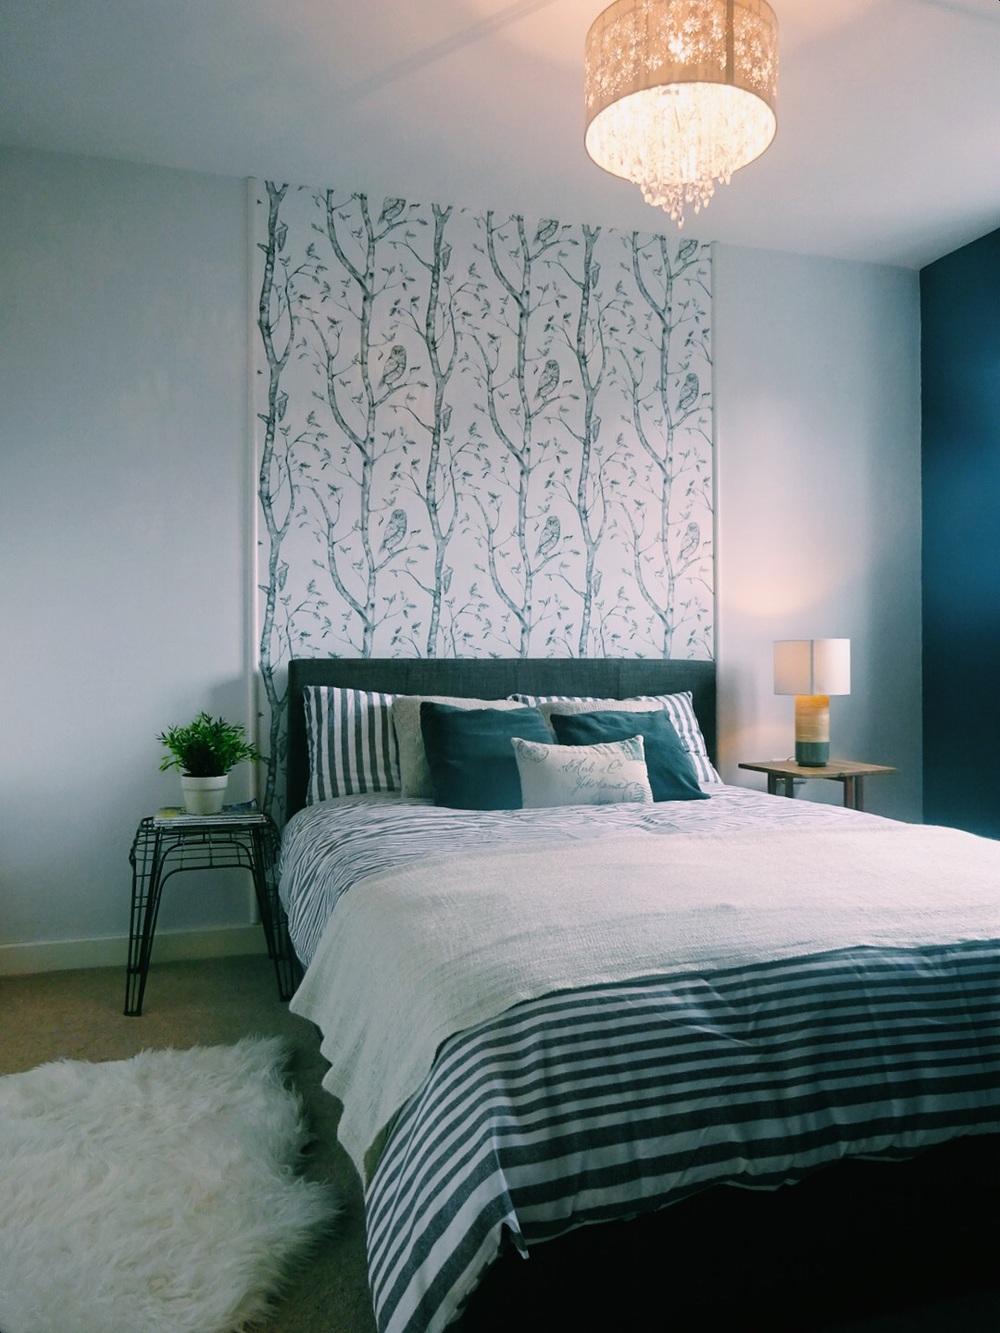 One cosy guest bedroom!